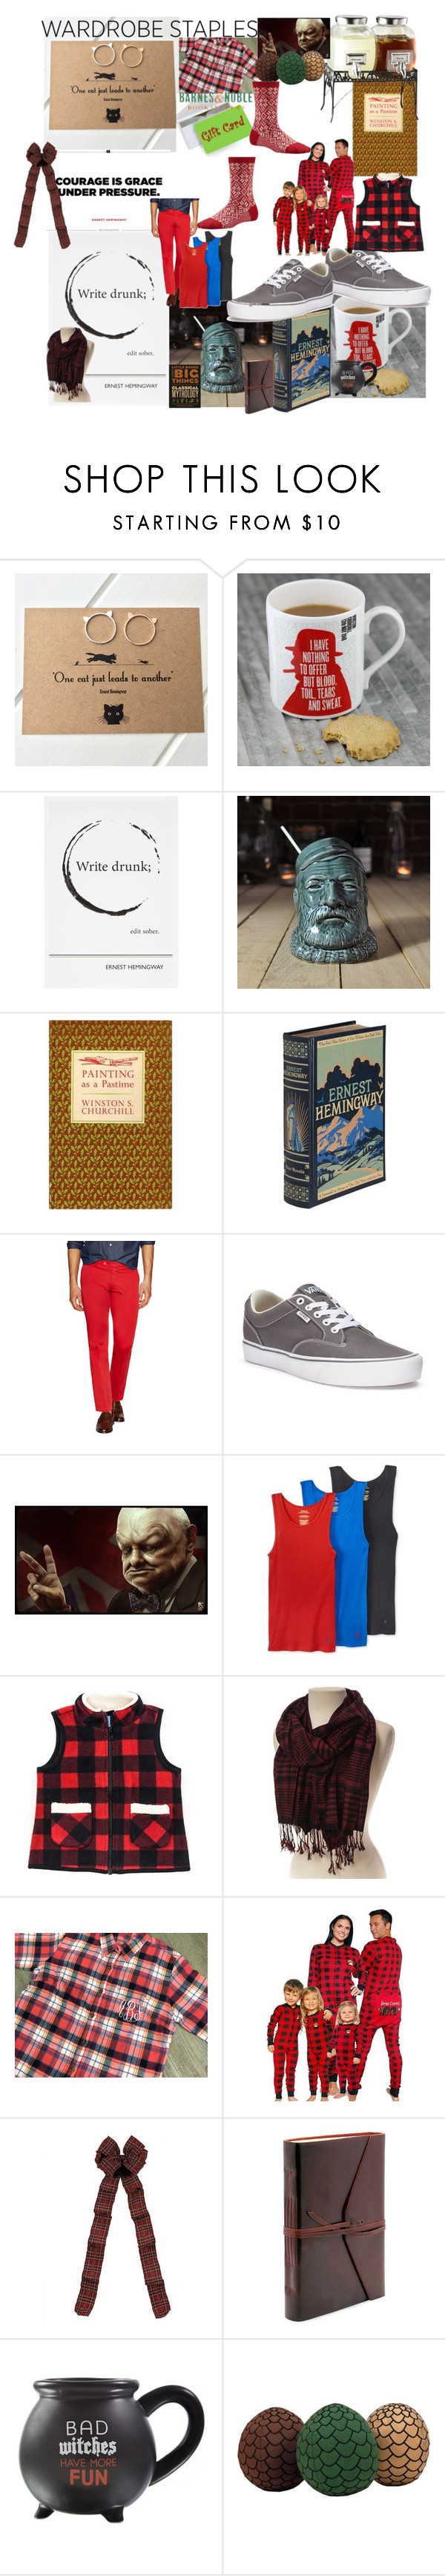 """Dudes love that store!!"" by lerp ❤ liked on Polyvore featuring Nest, Hemingway, Ernest Hemingway, Vans, Polo Ralph Lauren, Ballard Designs, men's fashion, menswear, plaid and WardrobeStaples"